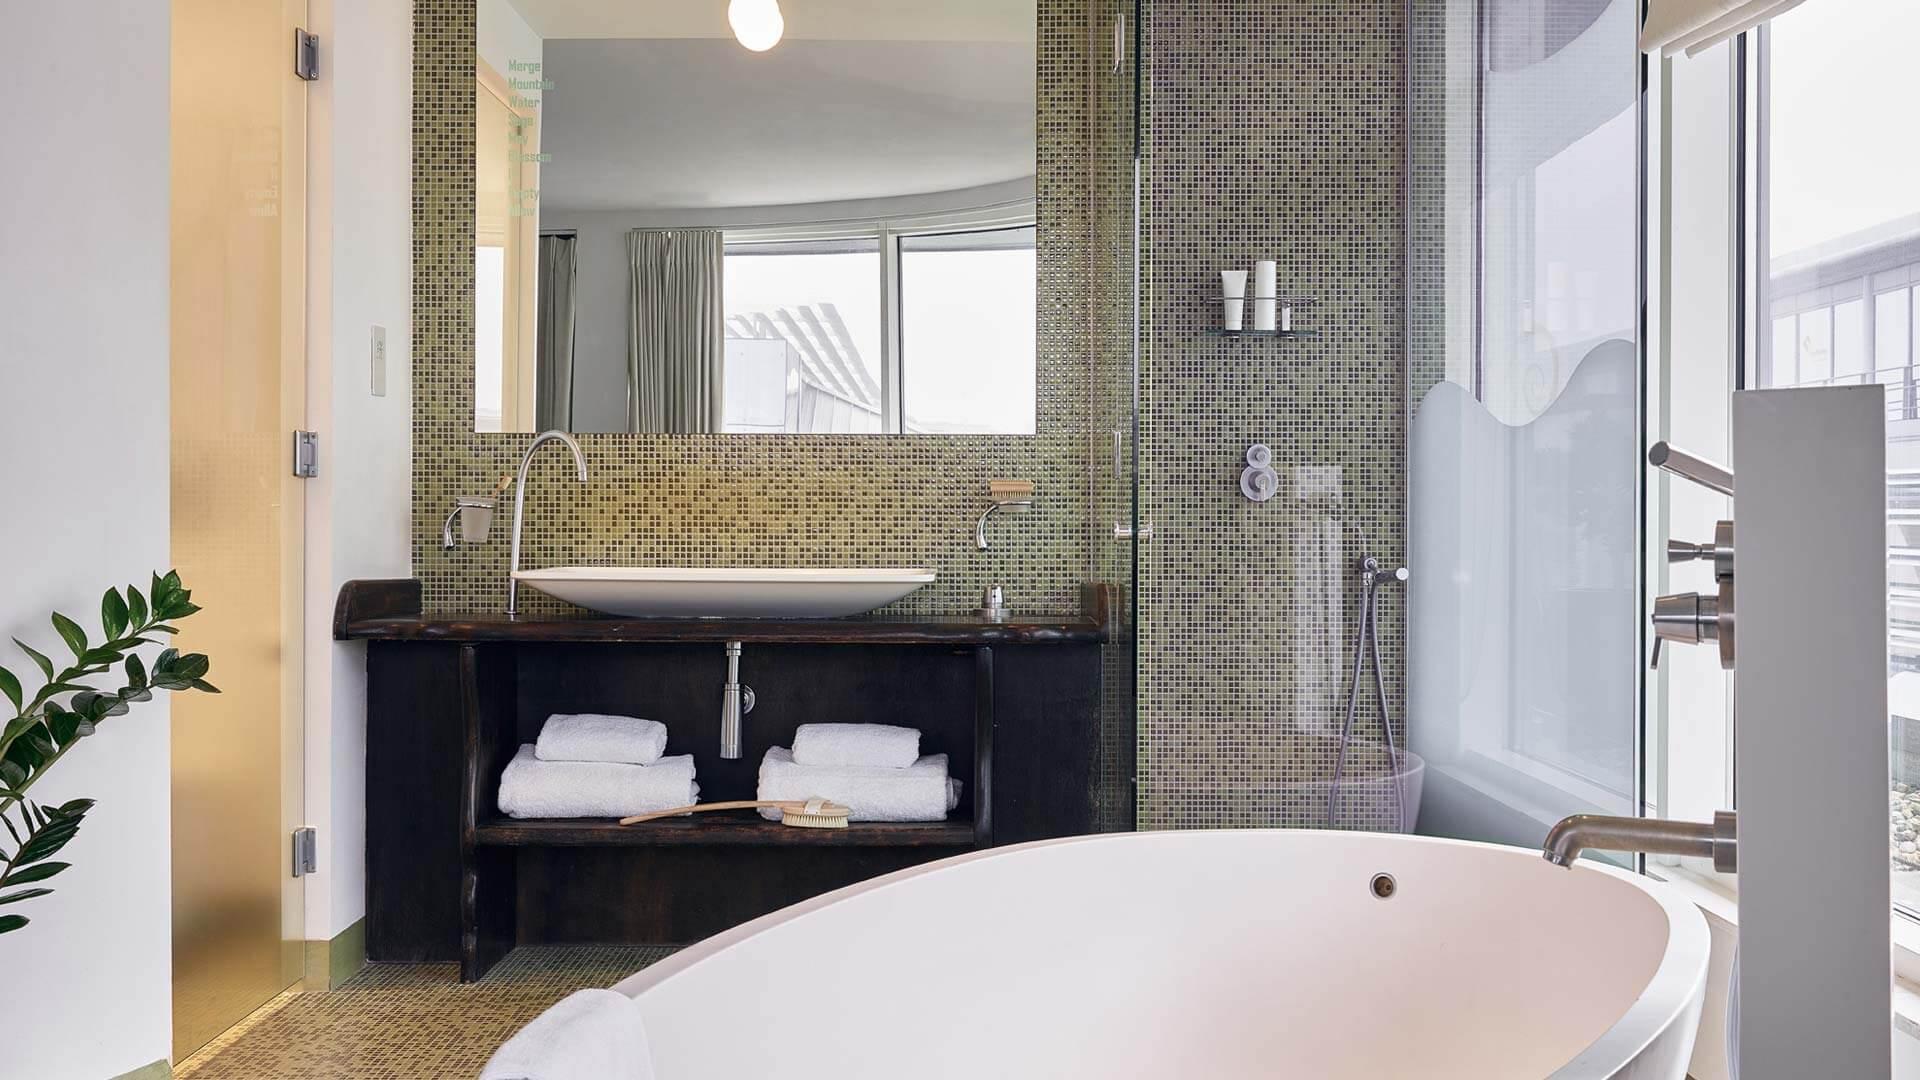 My Brighton - Design-led boutique hotel